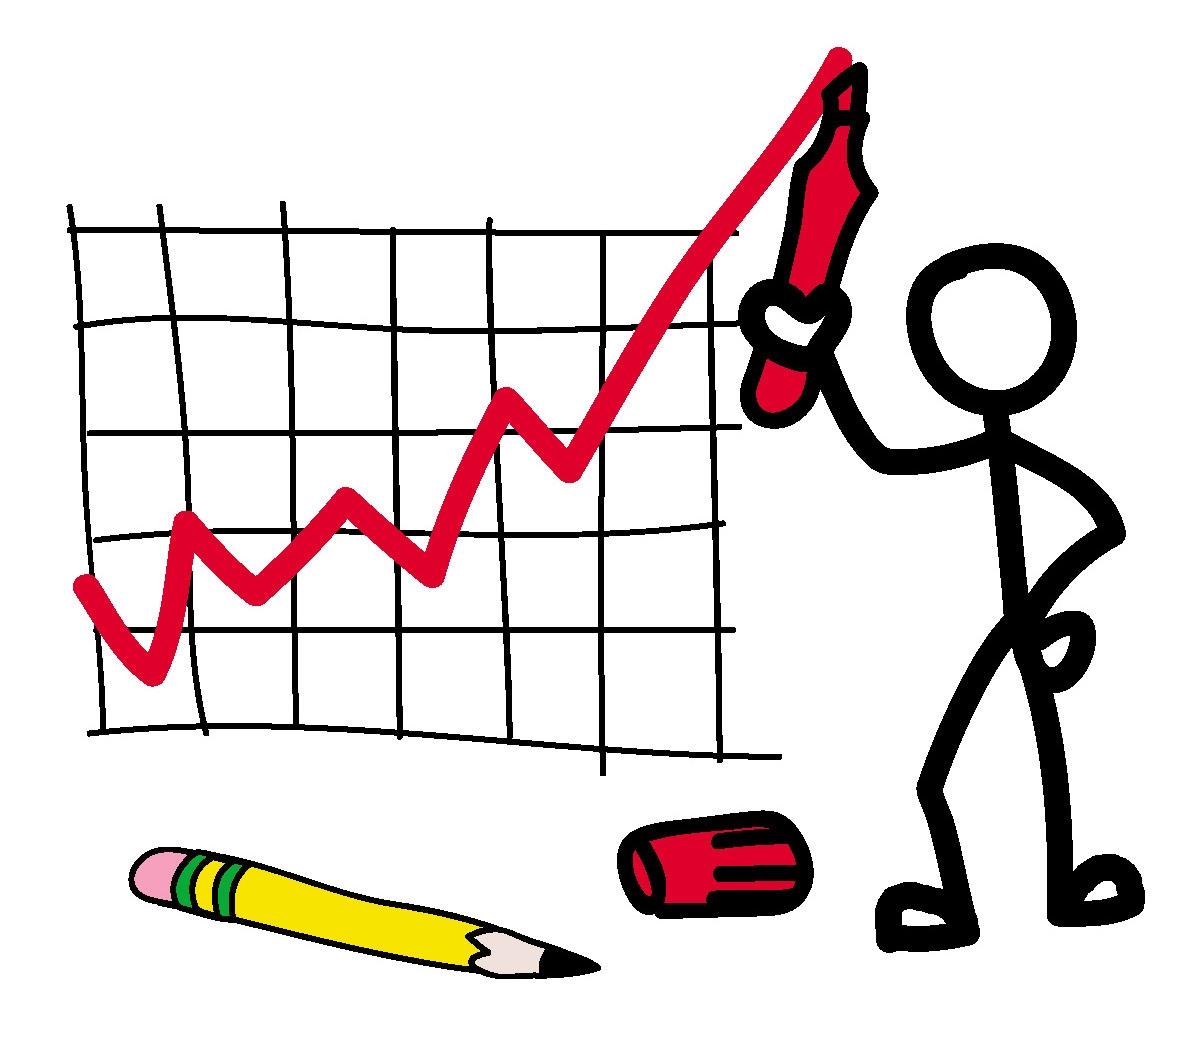 A stickman drawing a graph